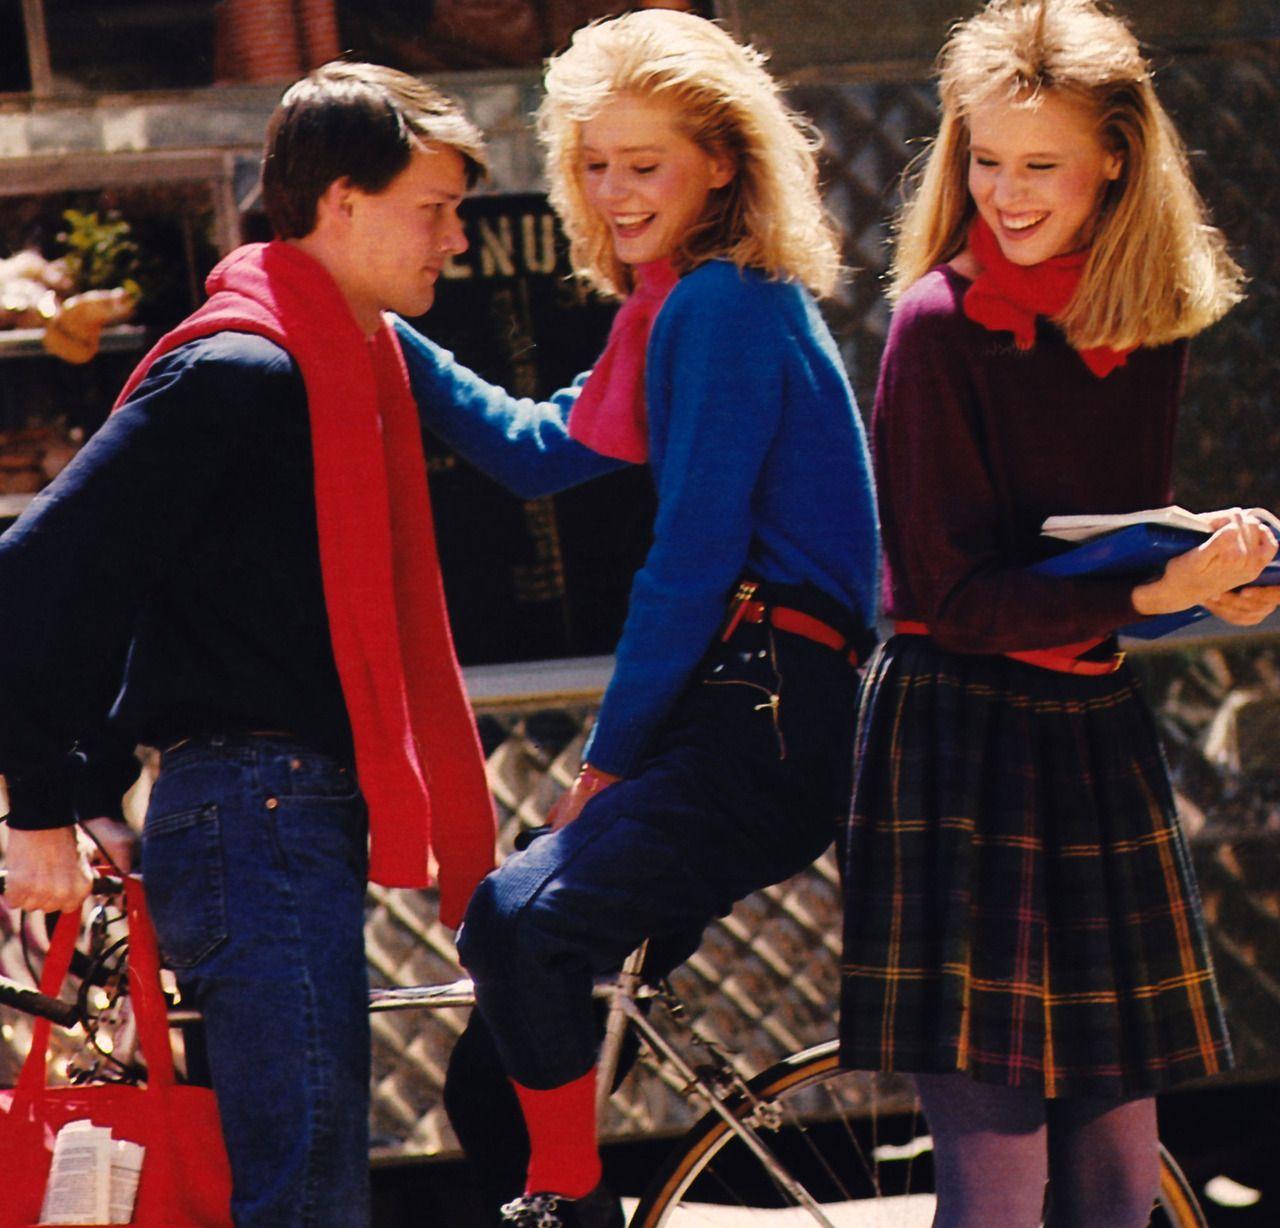 Мagazine Fashion 17 Only Sweet Girls: Robin Saidman For Seventeen Magazine, August 1983